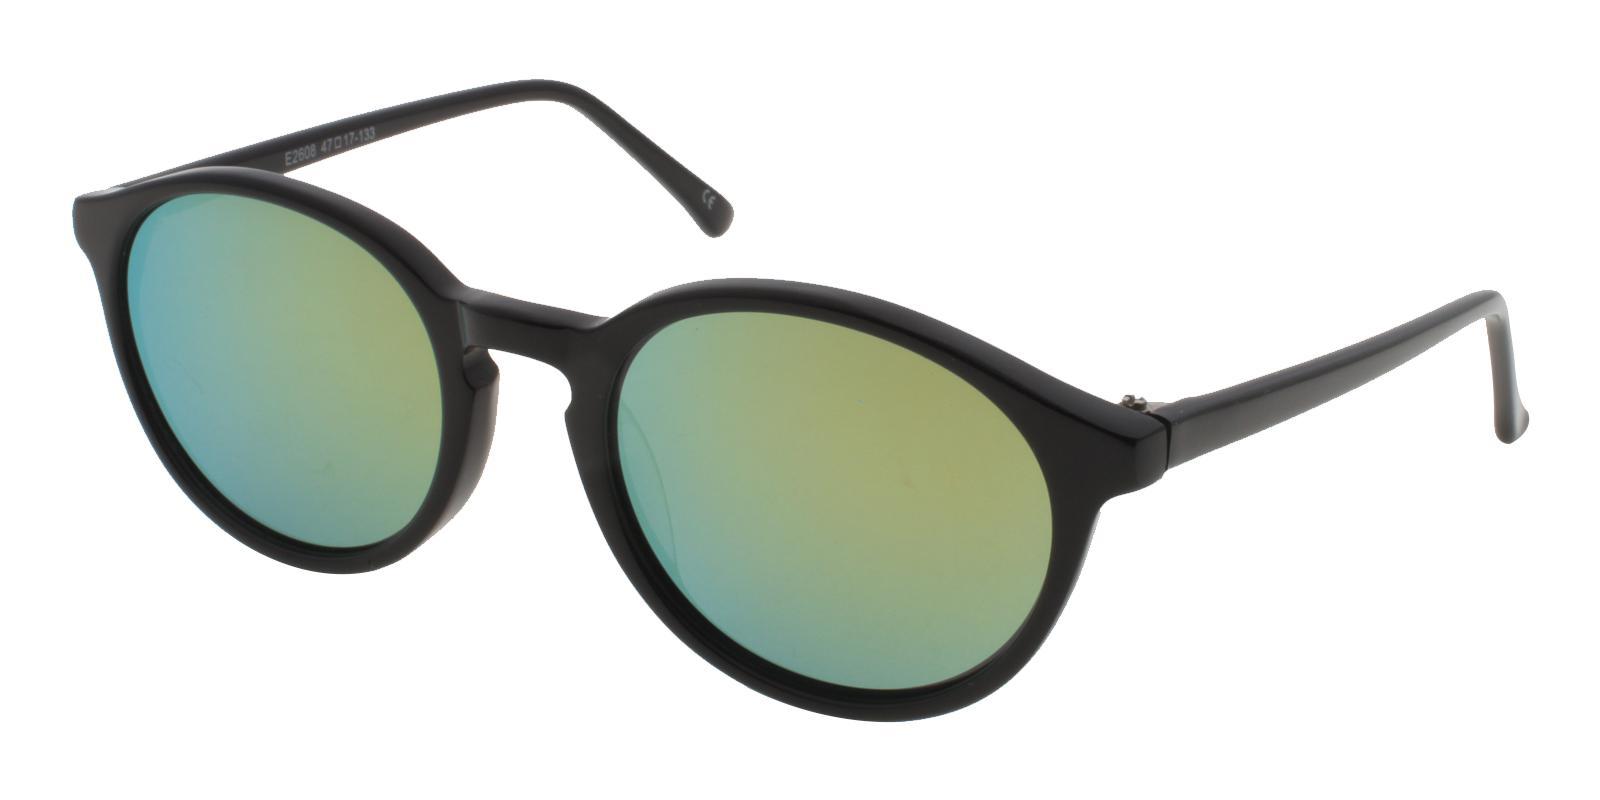 Kids-Gatzke Black Acetate Sunglasses , UniversalBridgeFit Frames from ABBE Glasses